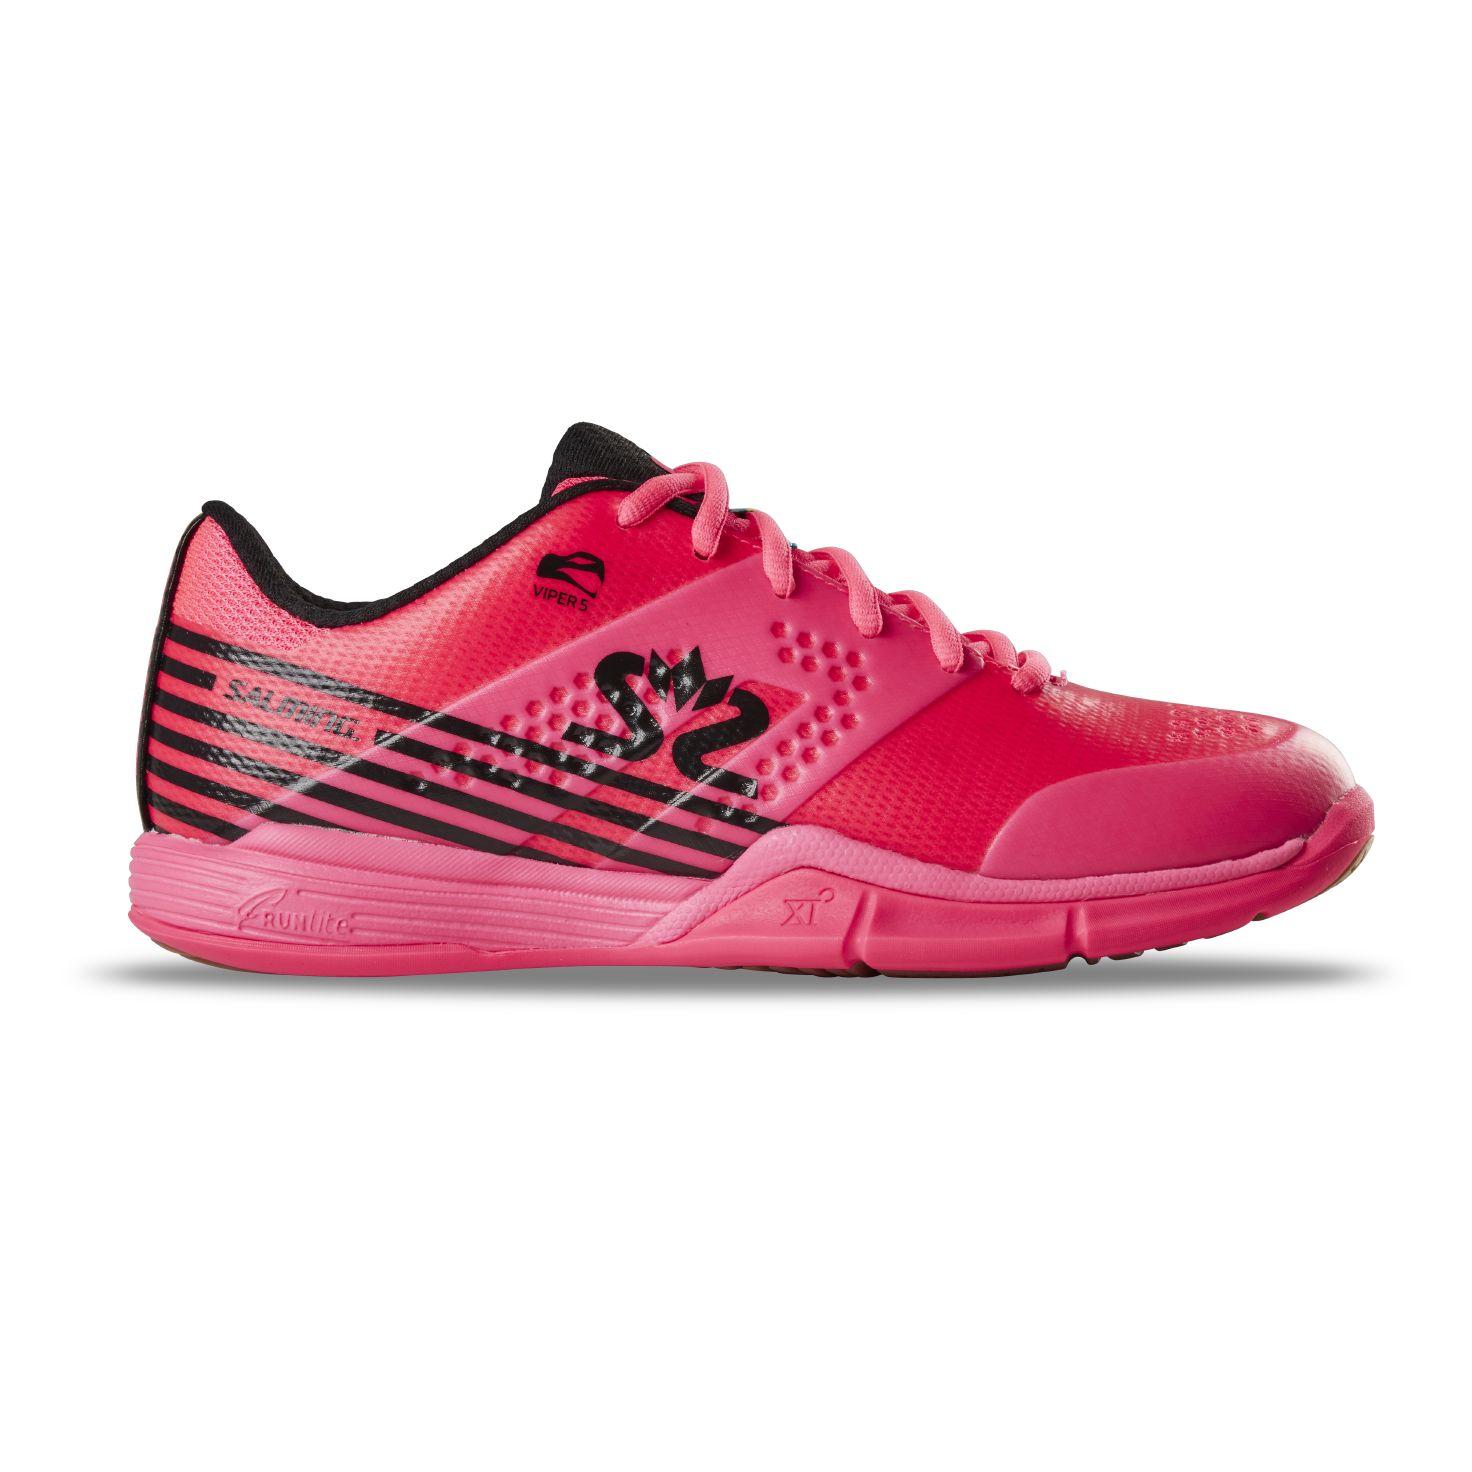 Salming Viper 5 Shoe Women Pink/Black 7,5 UK - 41 1/3 EUR - 26,5 cm